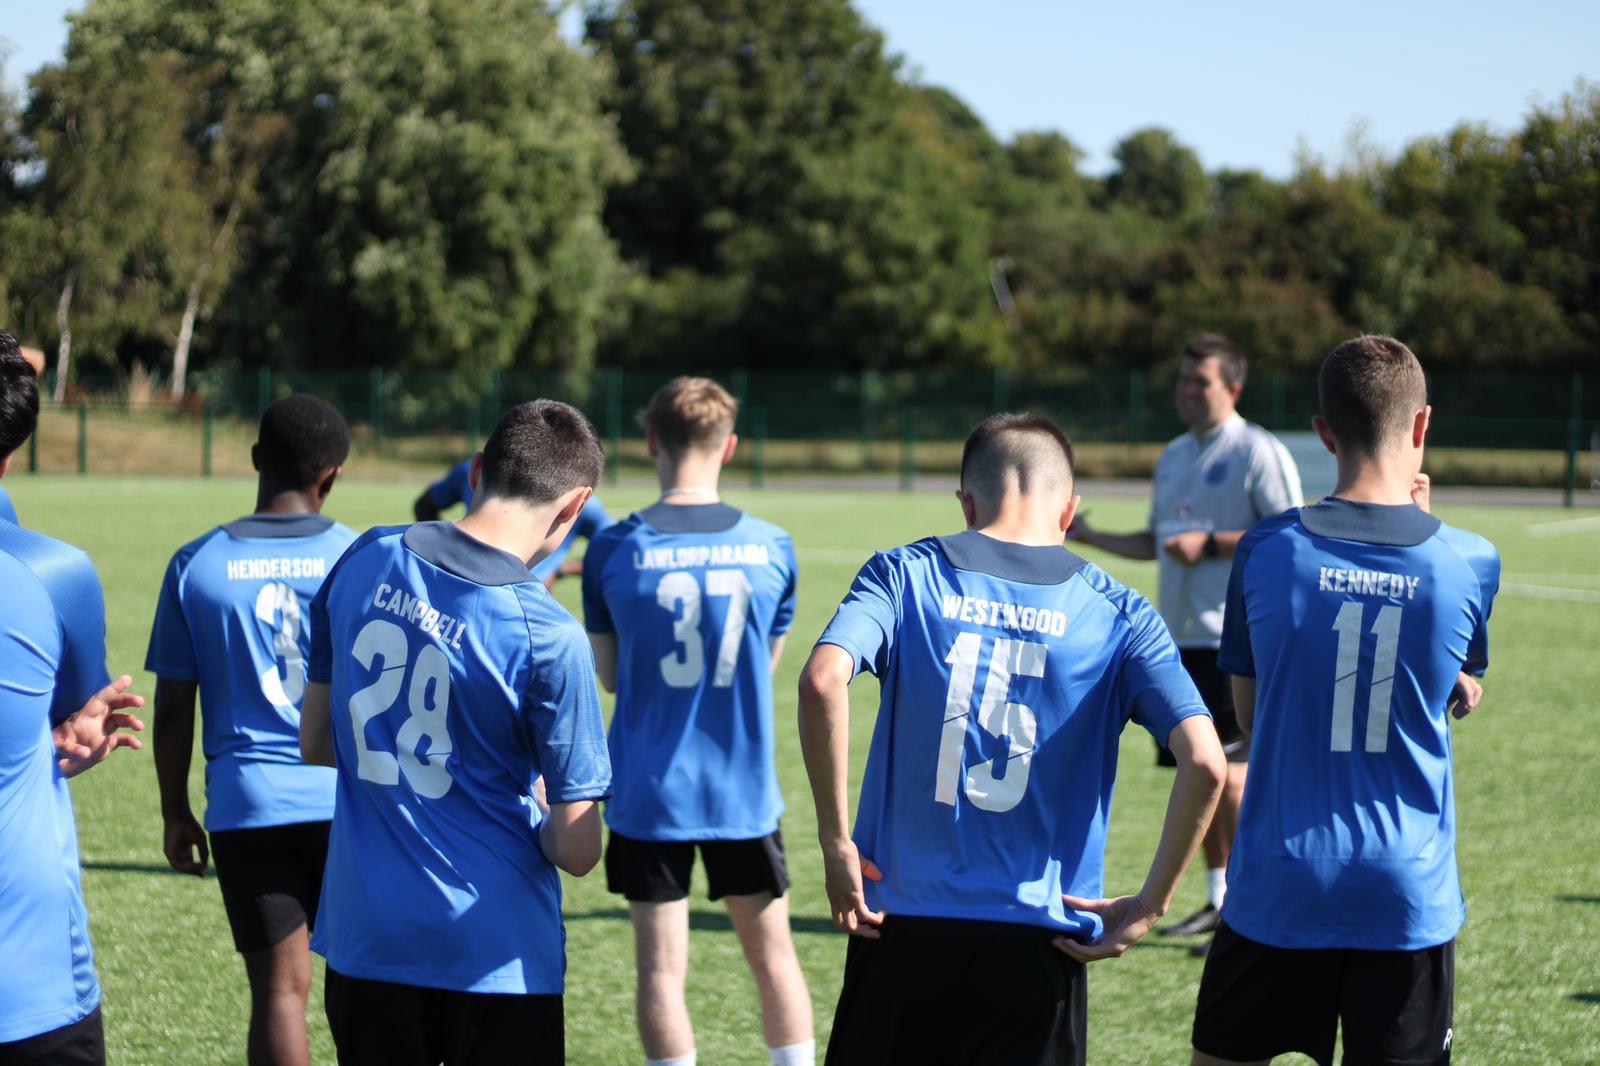 Lichfield FC Football Academy - The Football Experience